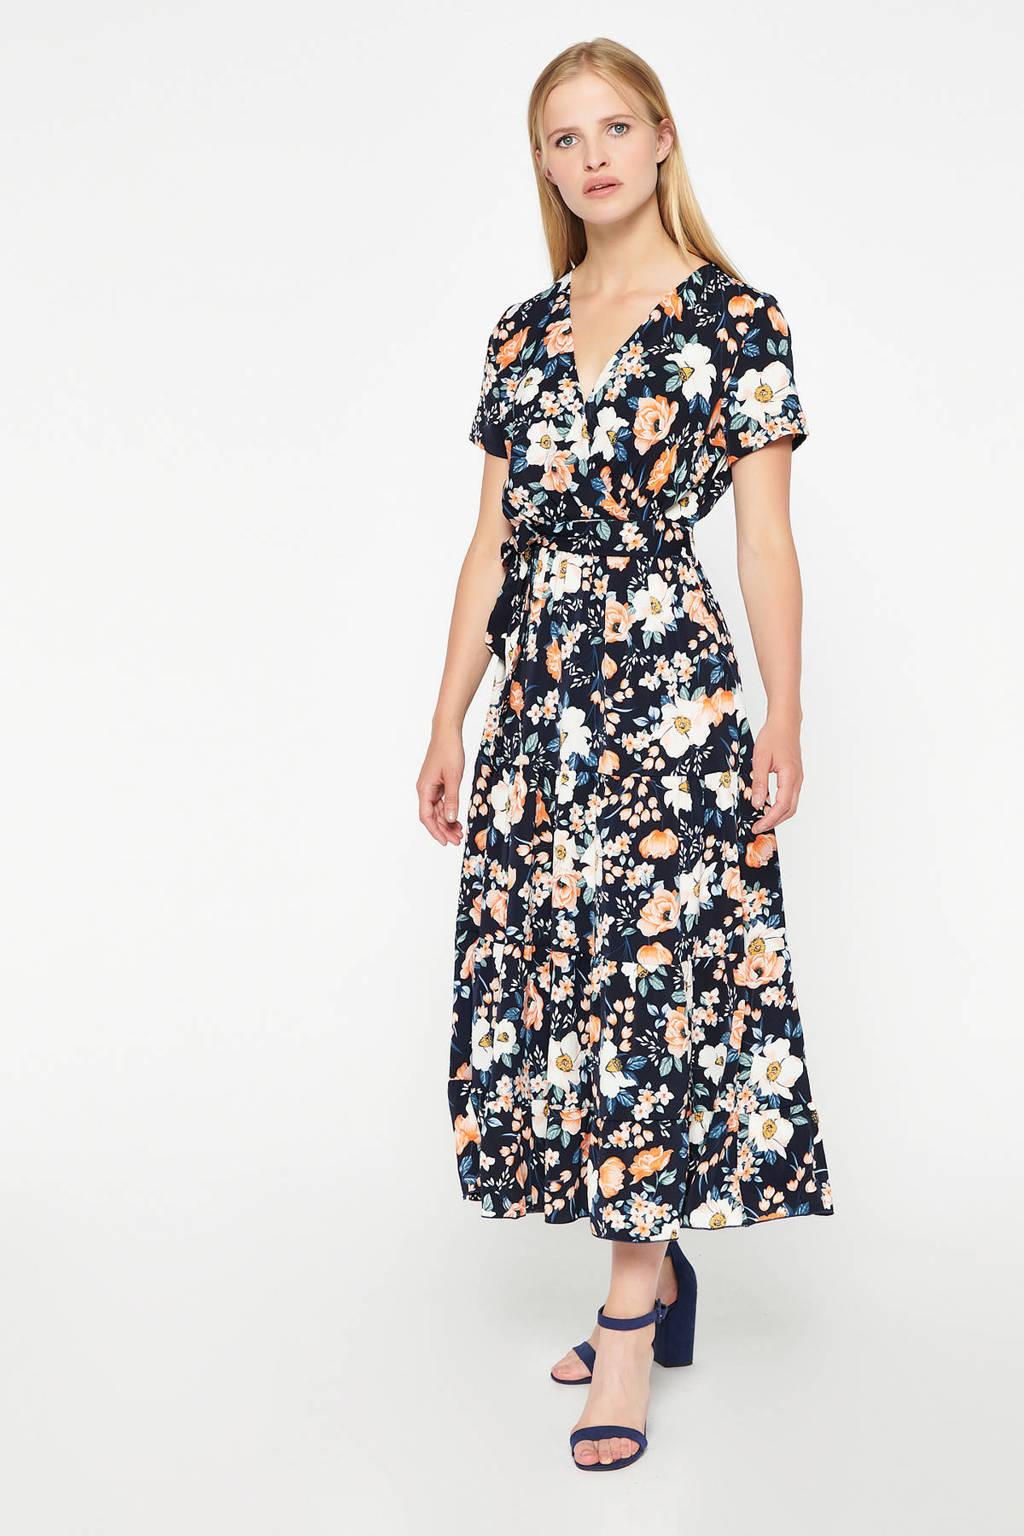 LOLALIZA gebloemde maxi jurk marine/multi, Marine/multi